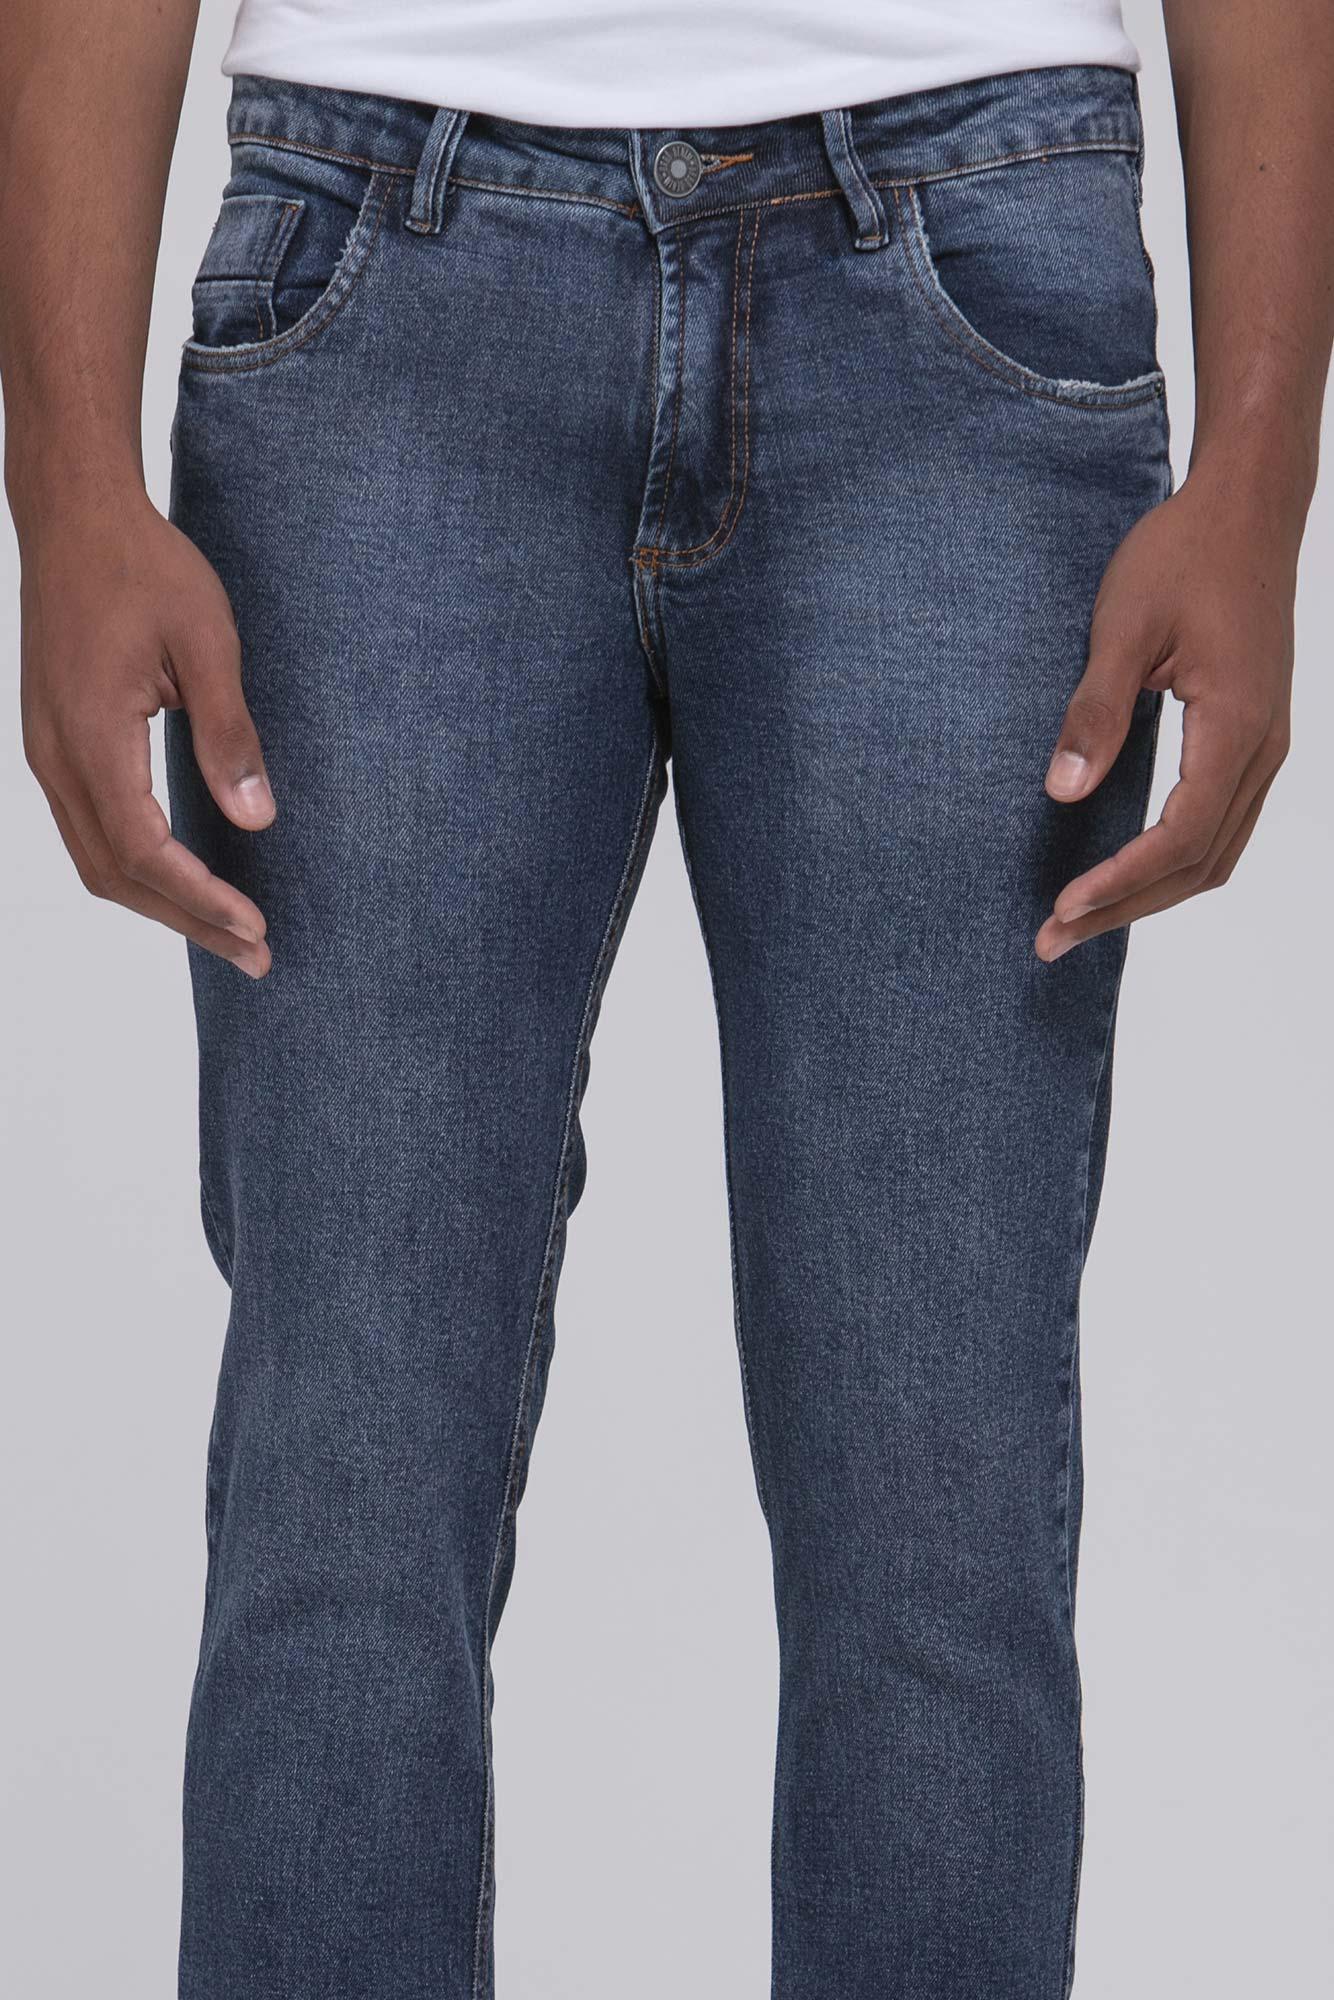 Calça Jeans Galaxy Flocked